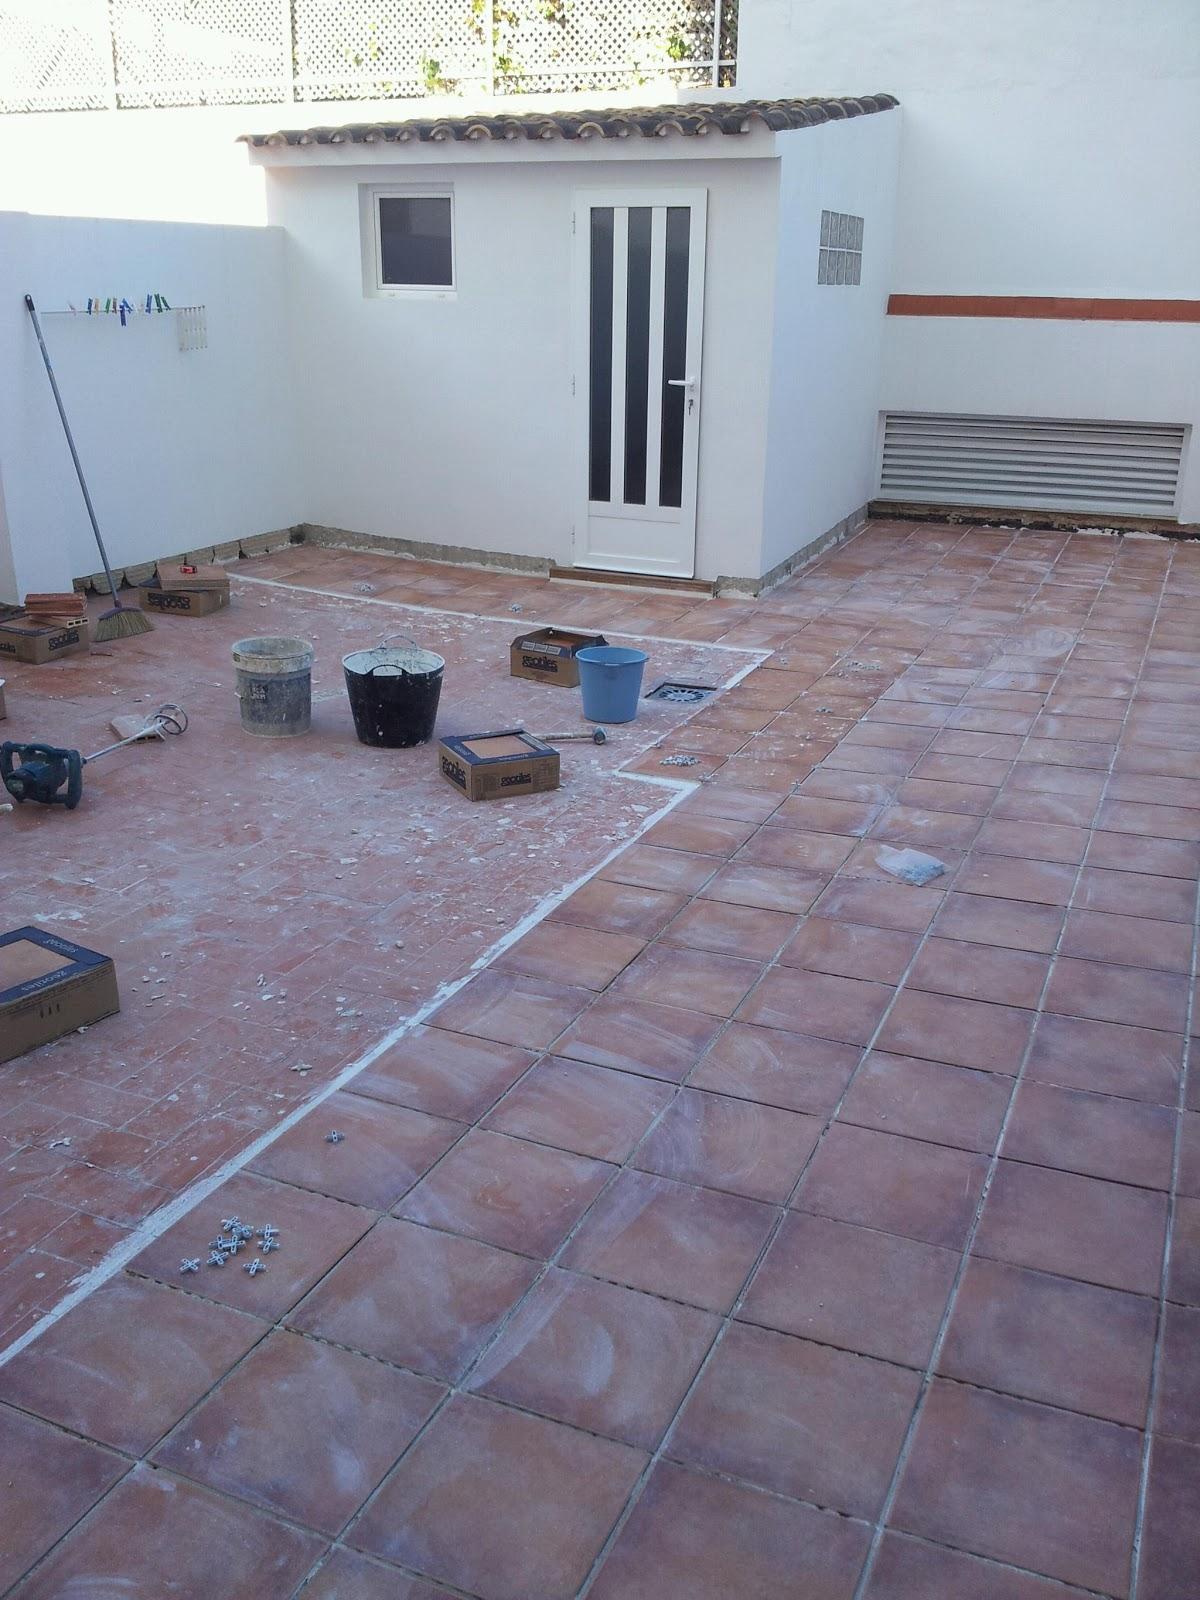 Poner piso rustico en la terraza toni alba il experto - Sacar escuadra para colocar piso ...